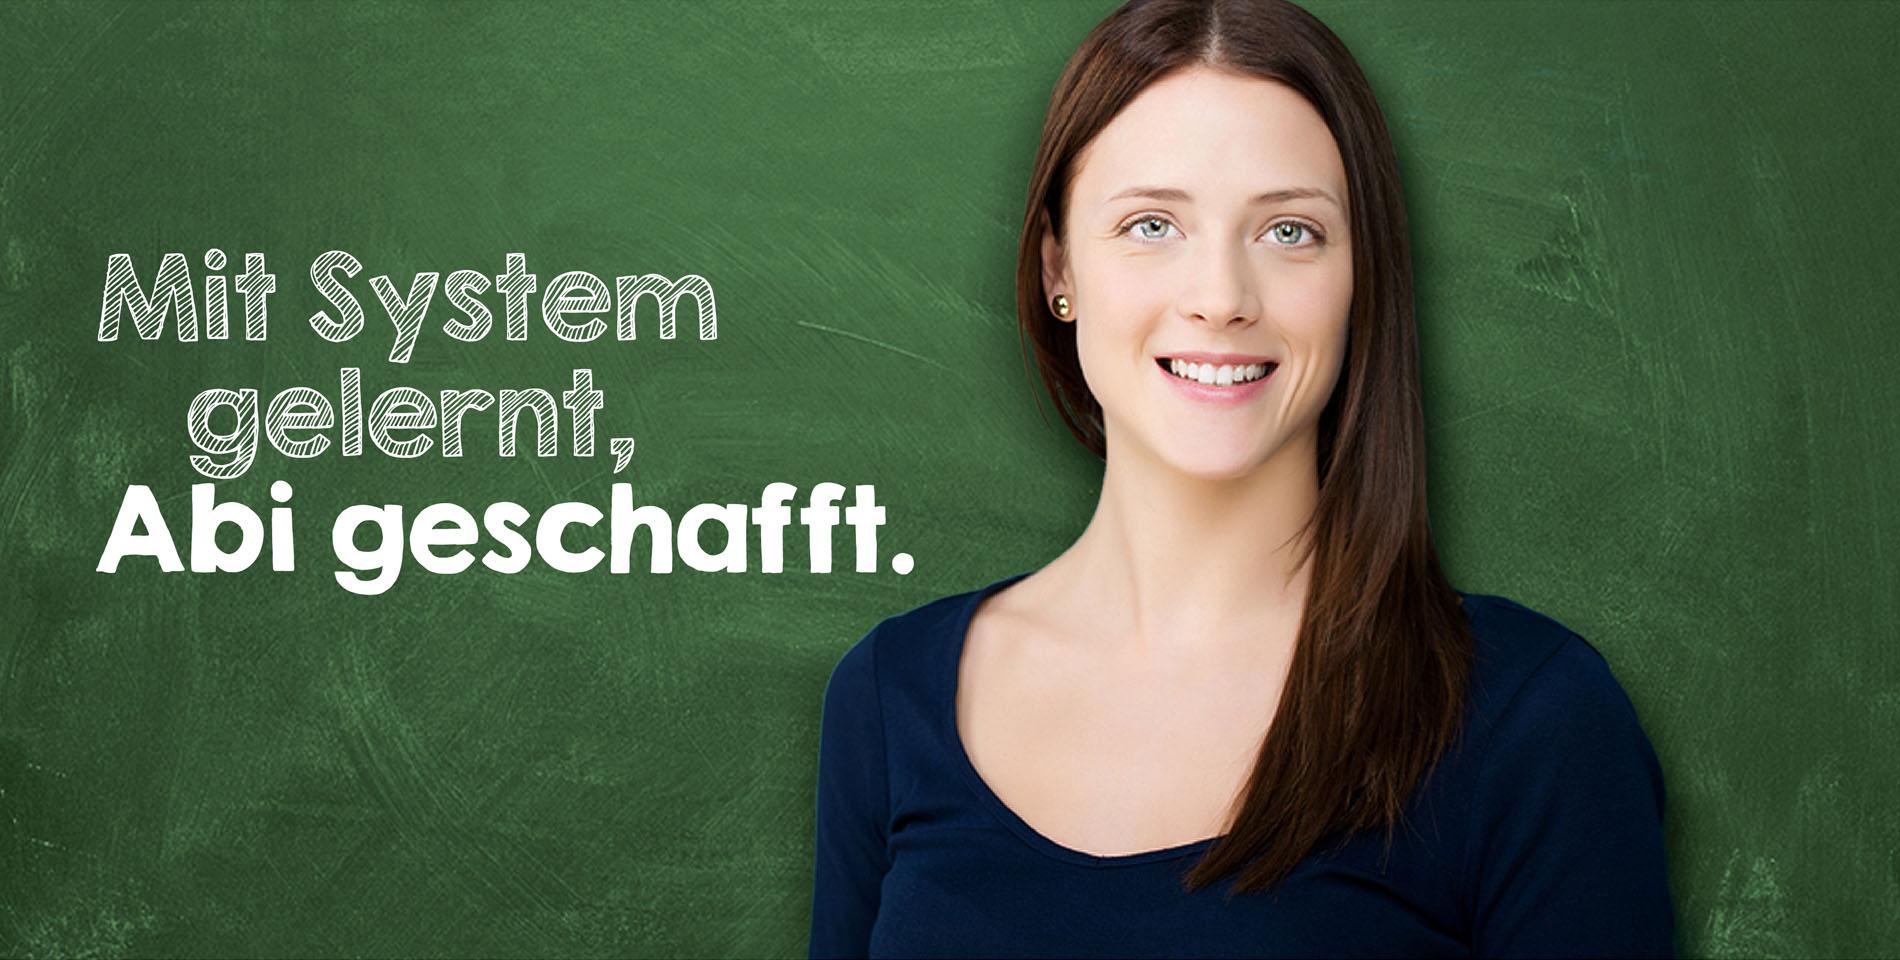 Abi Abitur Crashkurse Vorbereitungskurse Intensivkurse Nachhilfe Fürth